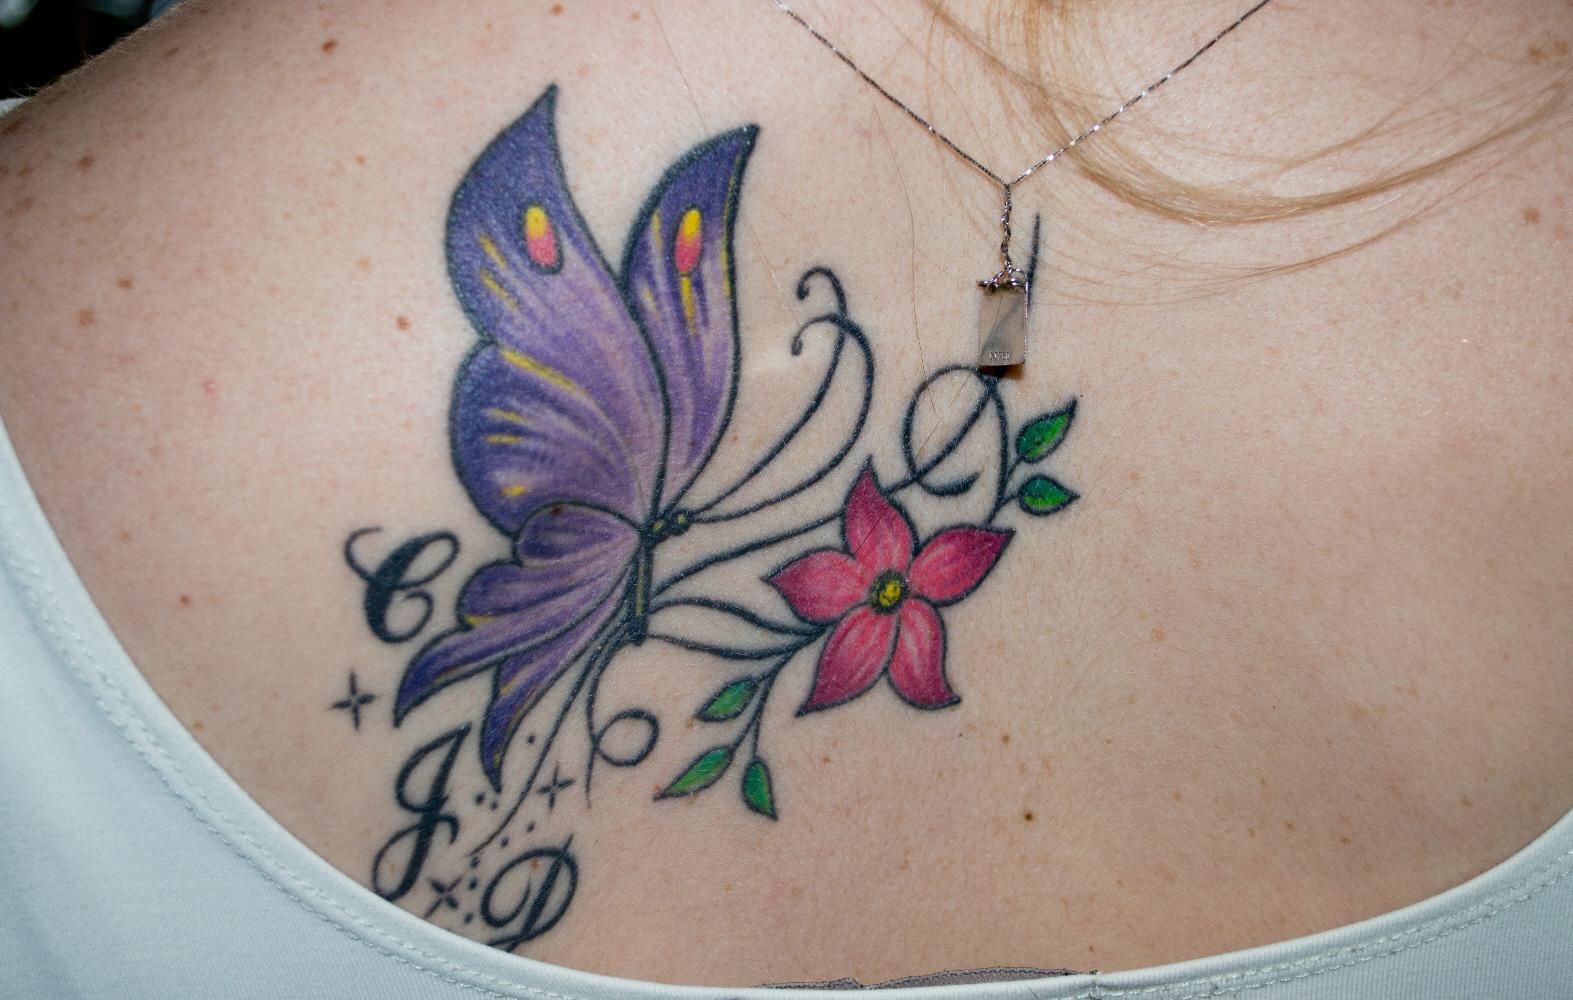 imagens-iumagens-de-tatuagens-de-borboletas